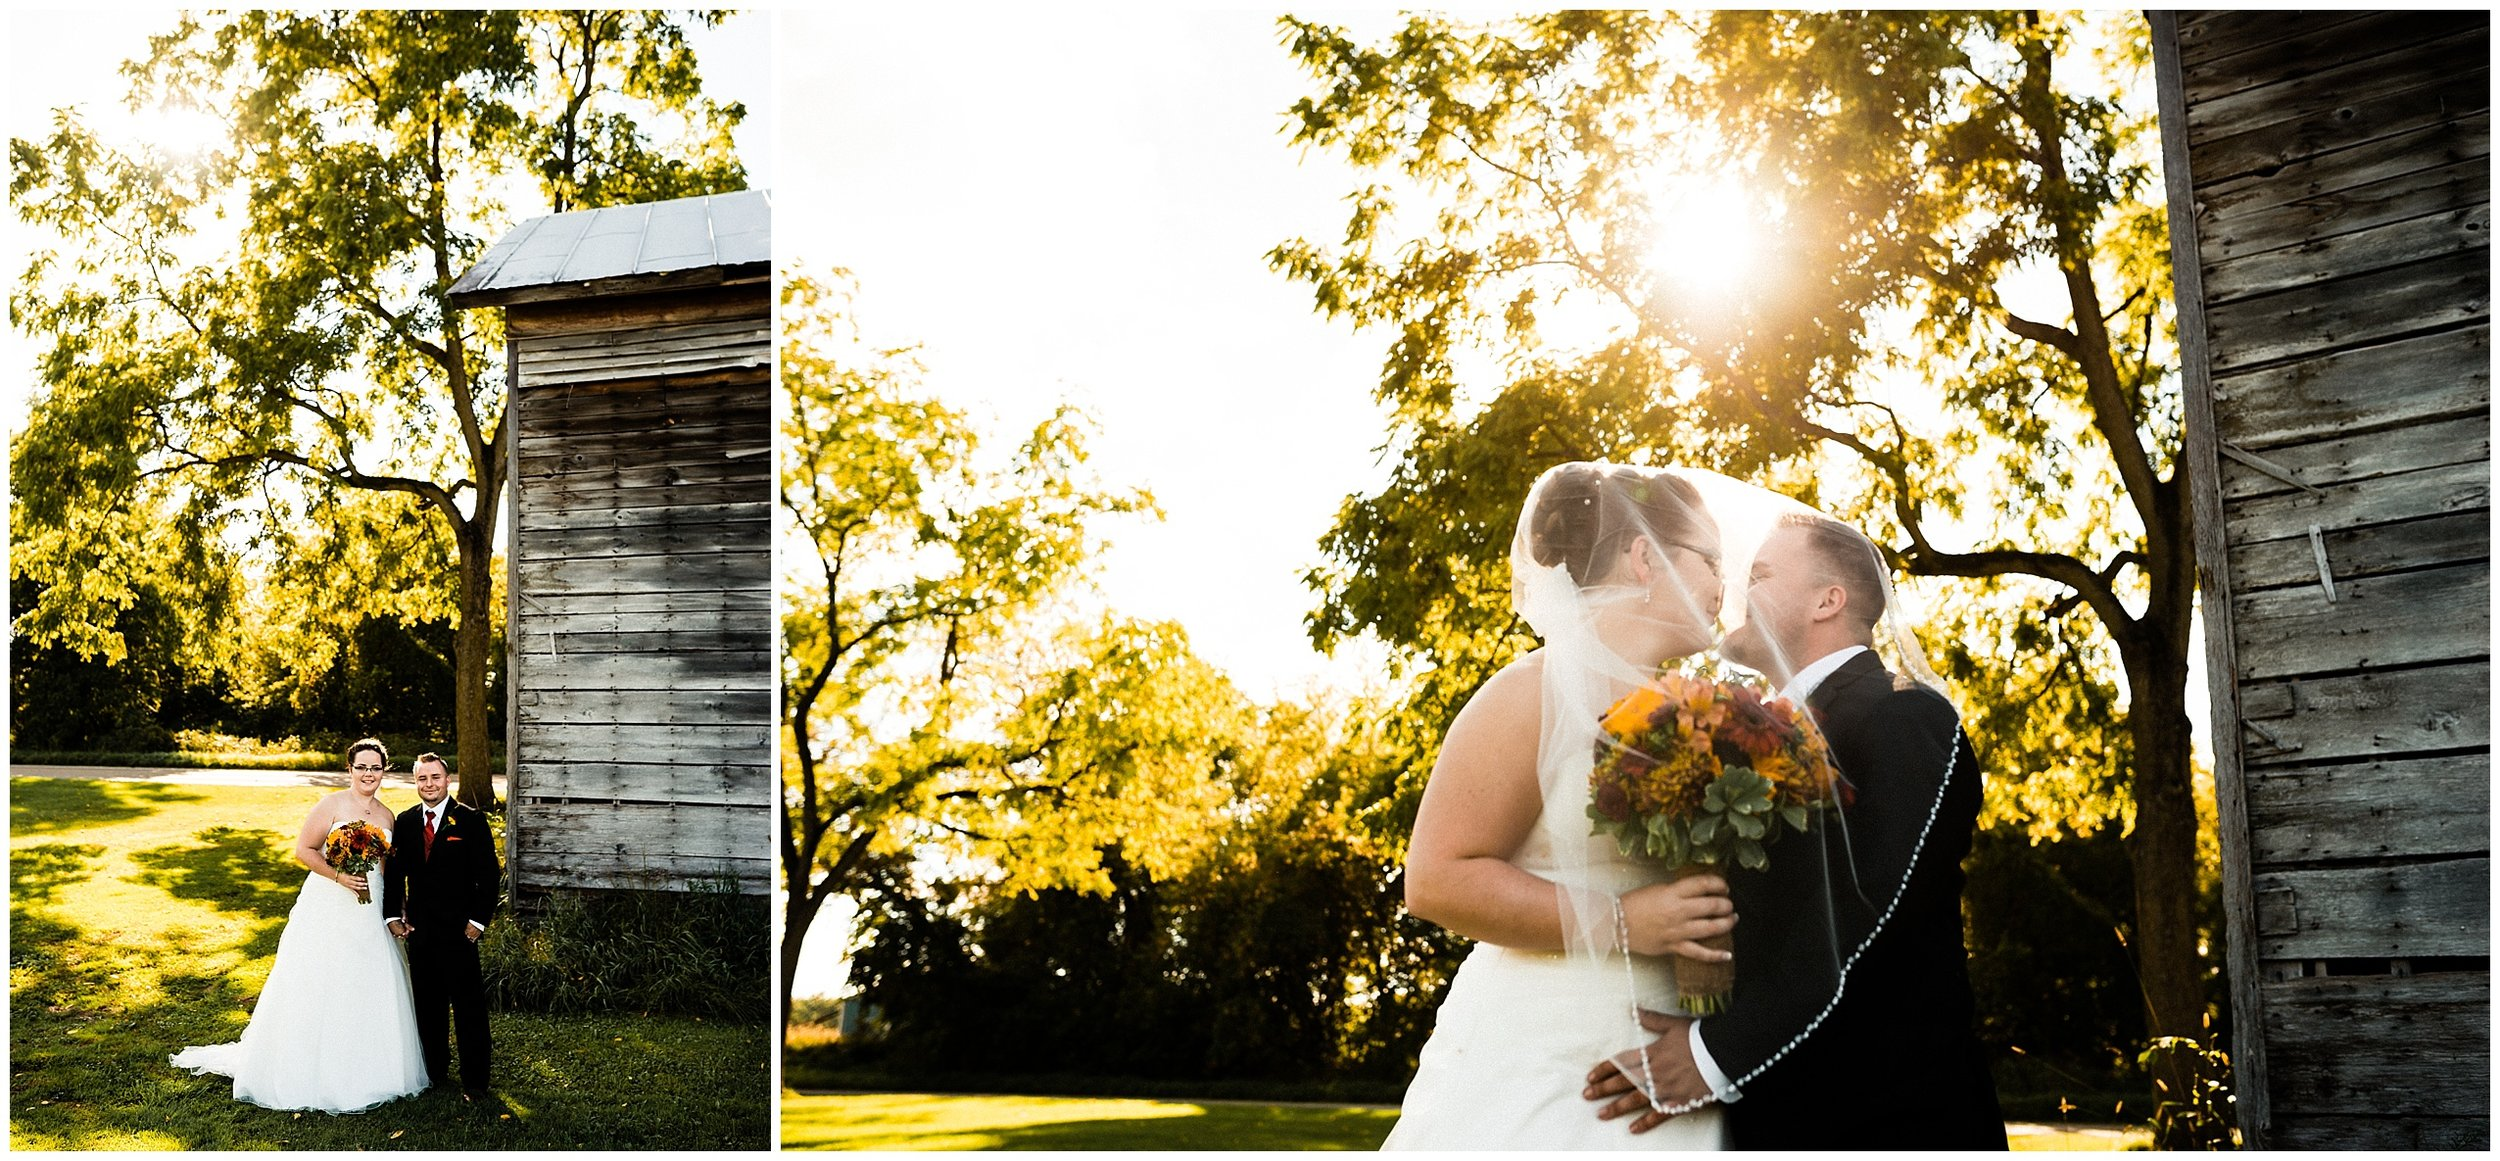 Micheal + Chelsie   Just Married #kyleepaigephotography_1579.jpg